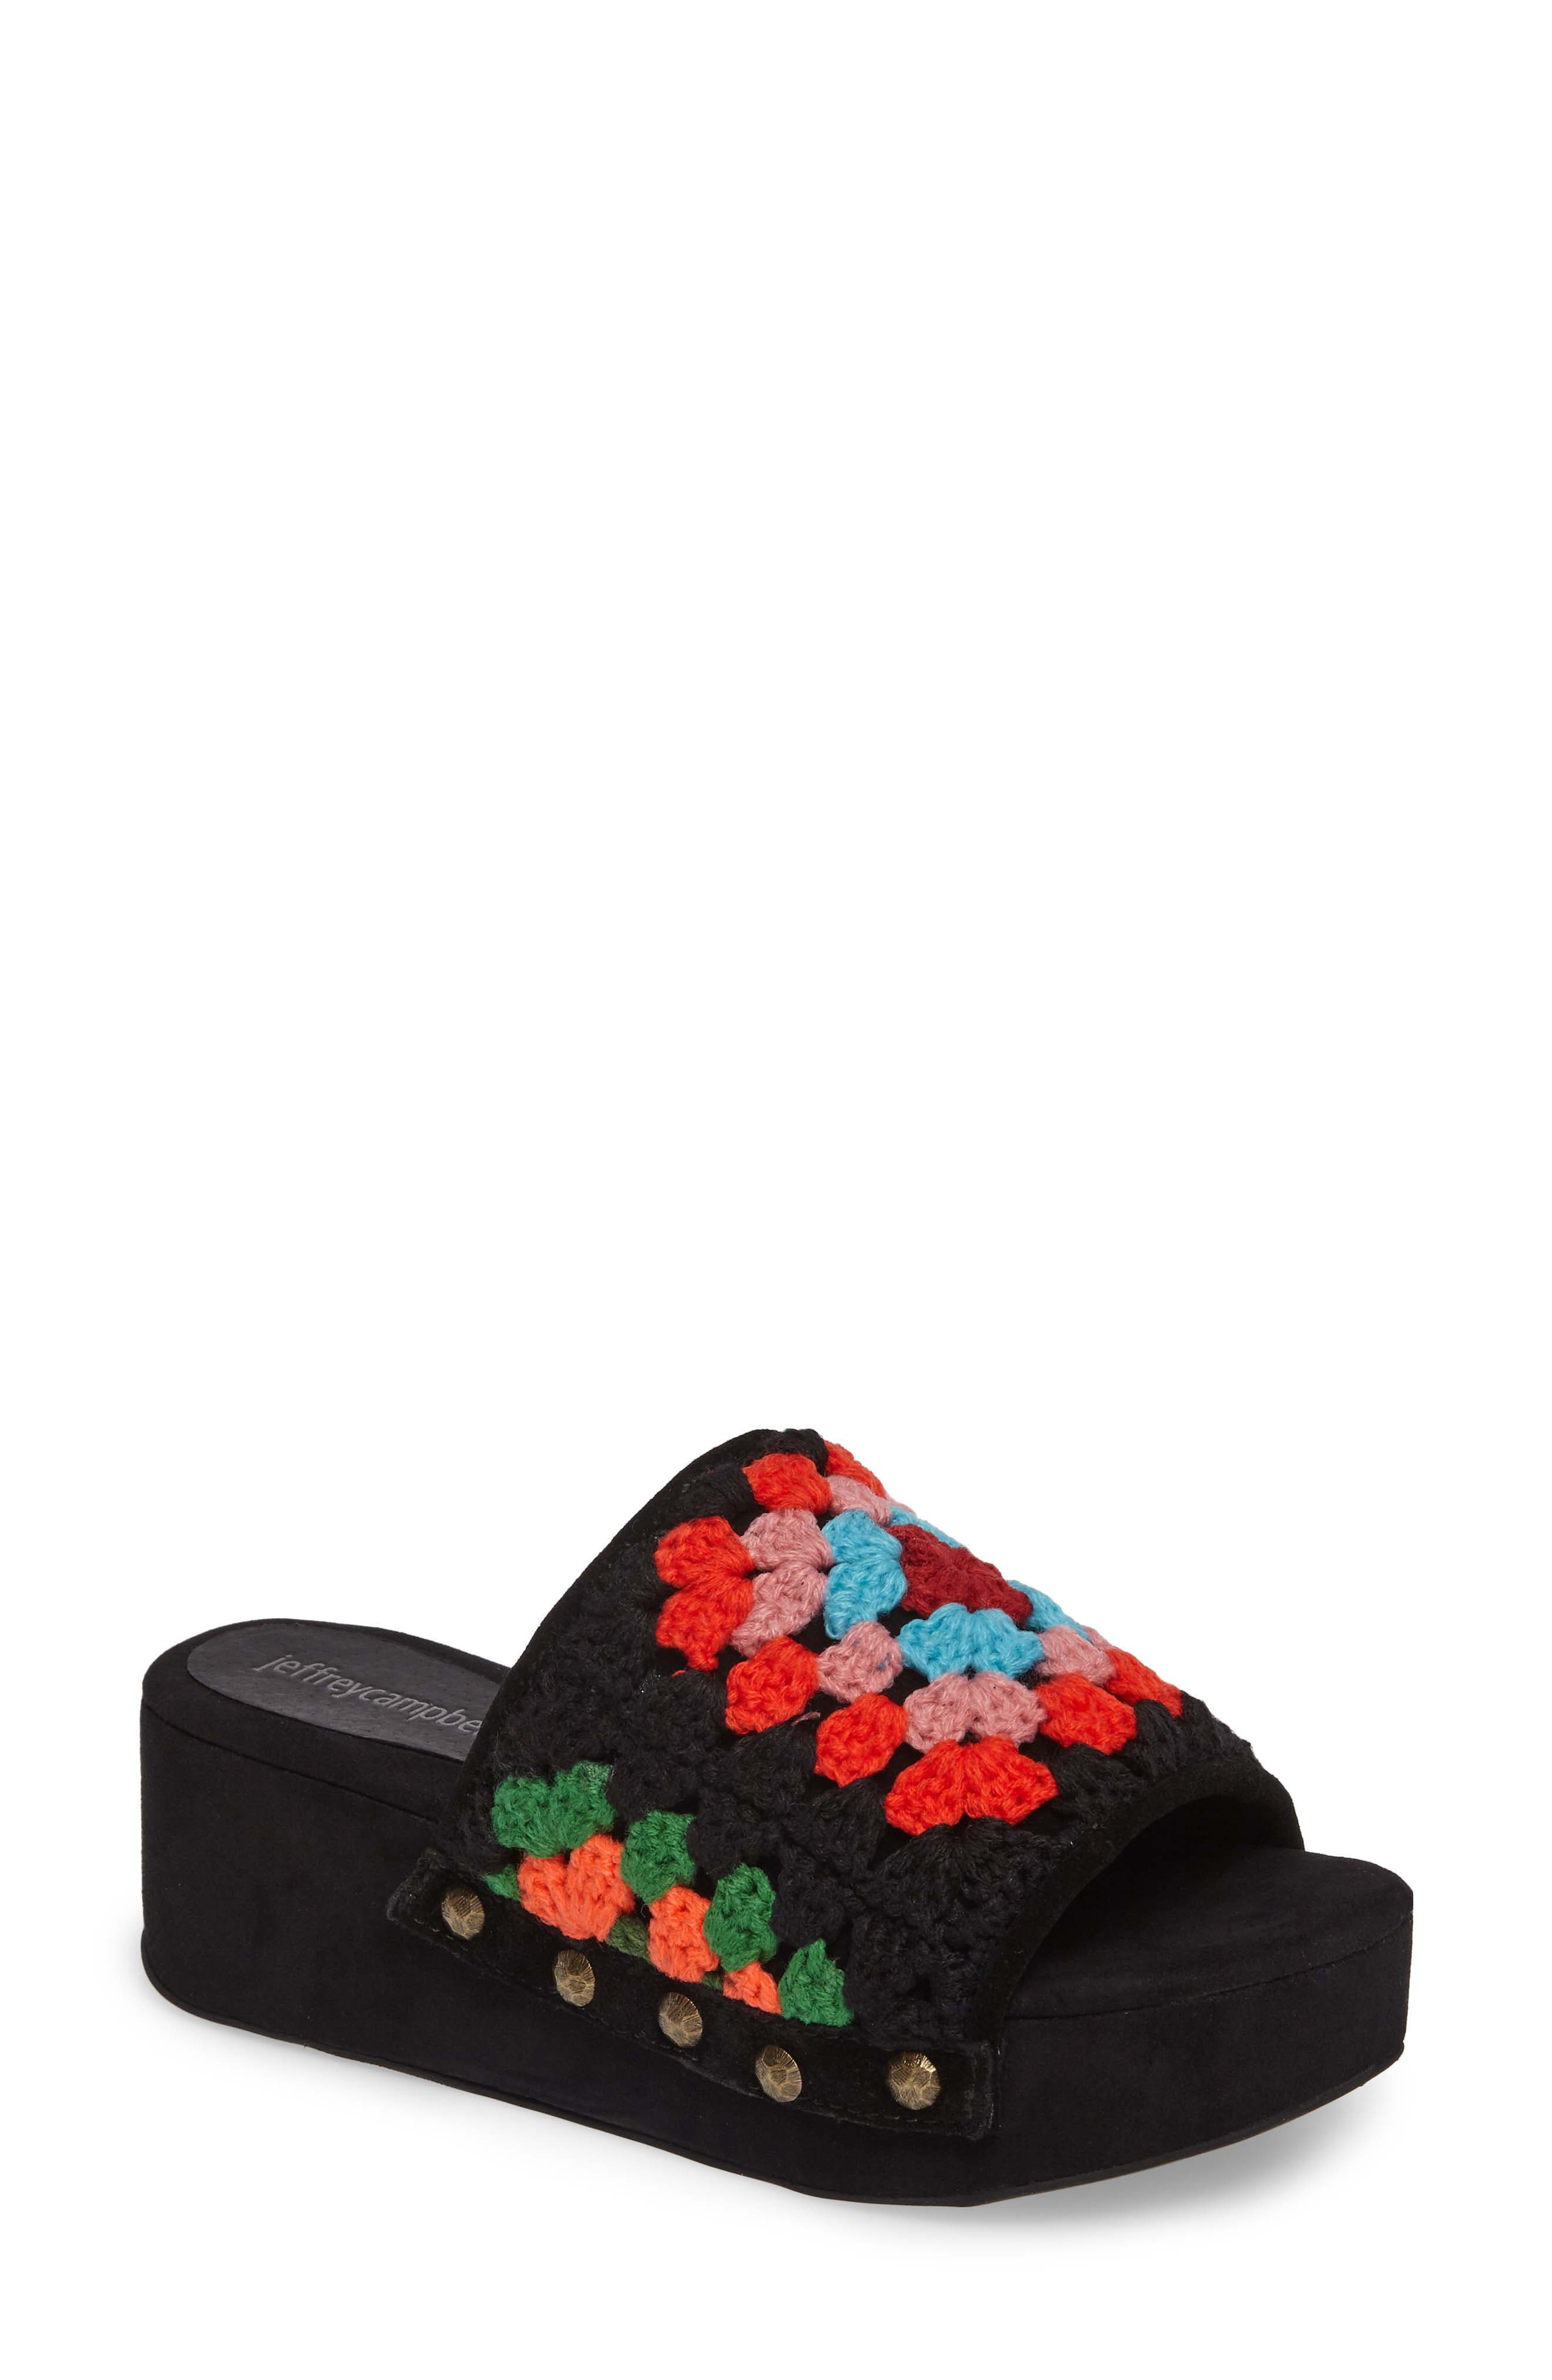 Nonna Crocheted Platform Slide Sandal,                             Main thumbnail 1, color,